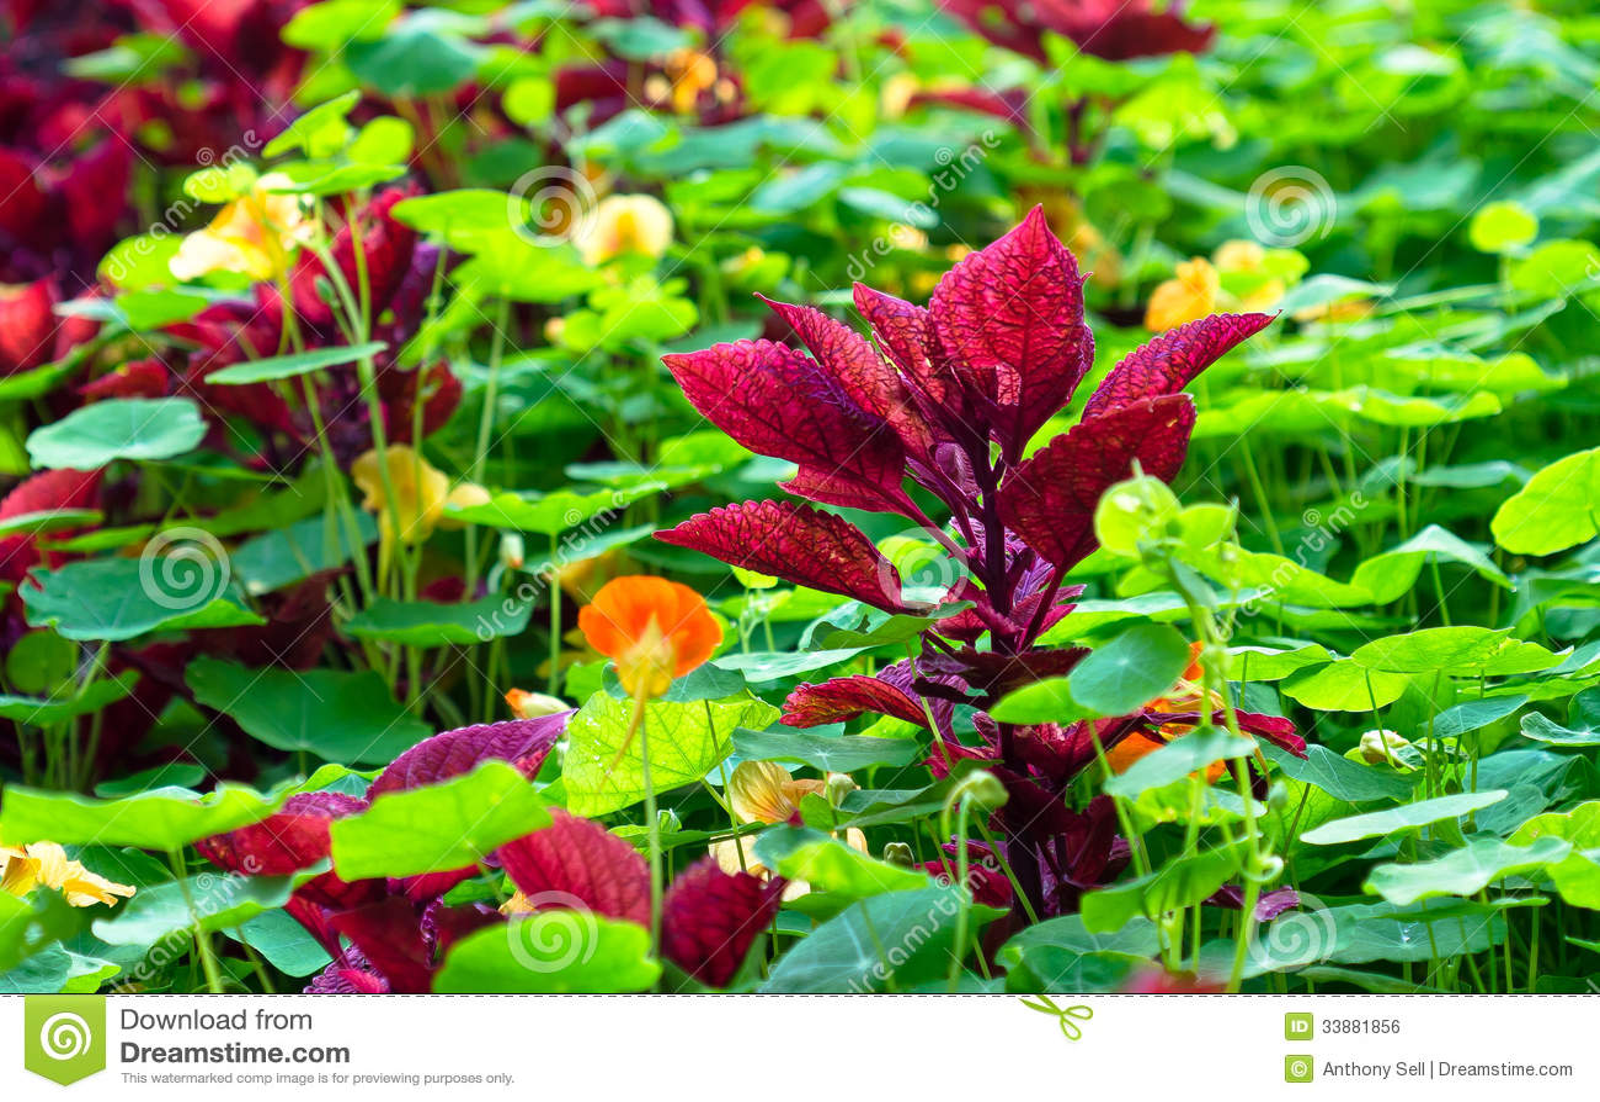 Maroon Coleus Plant Royalty Free Stock Image Image 33881856